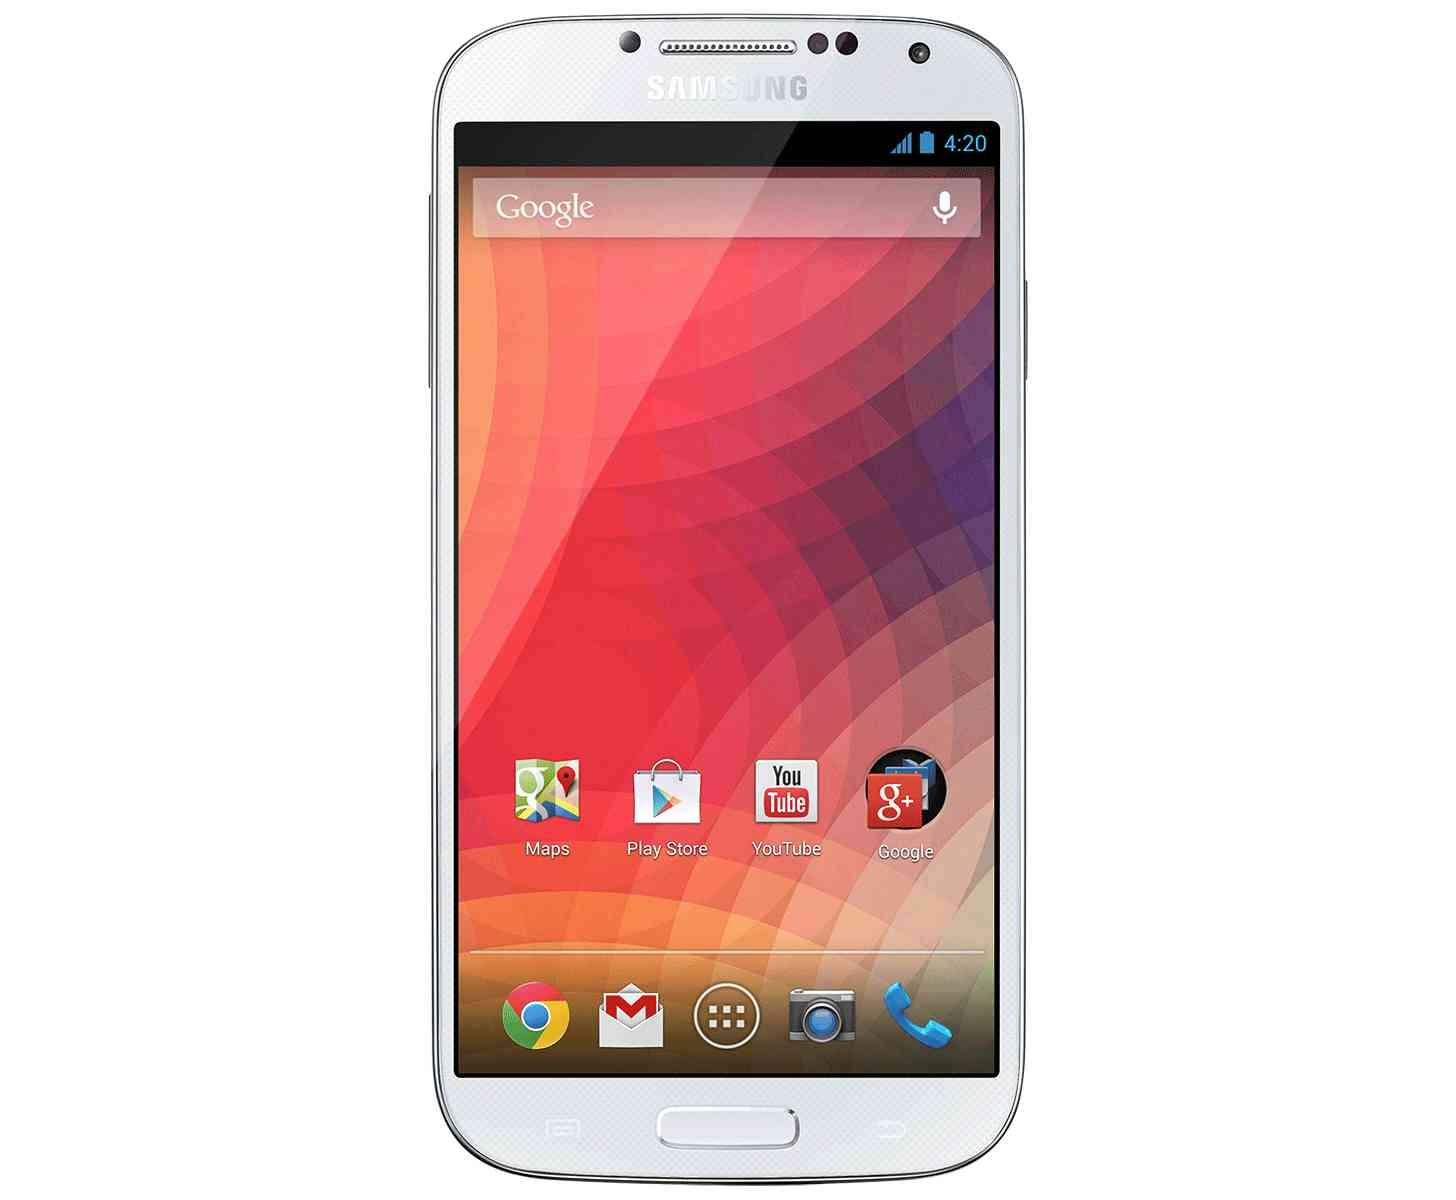 Samsung Galaxy S4 Google Play edition large